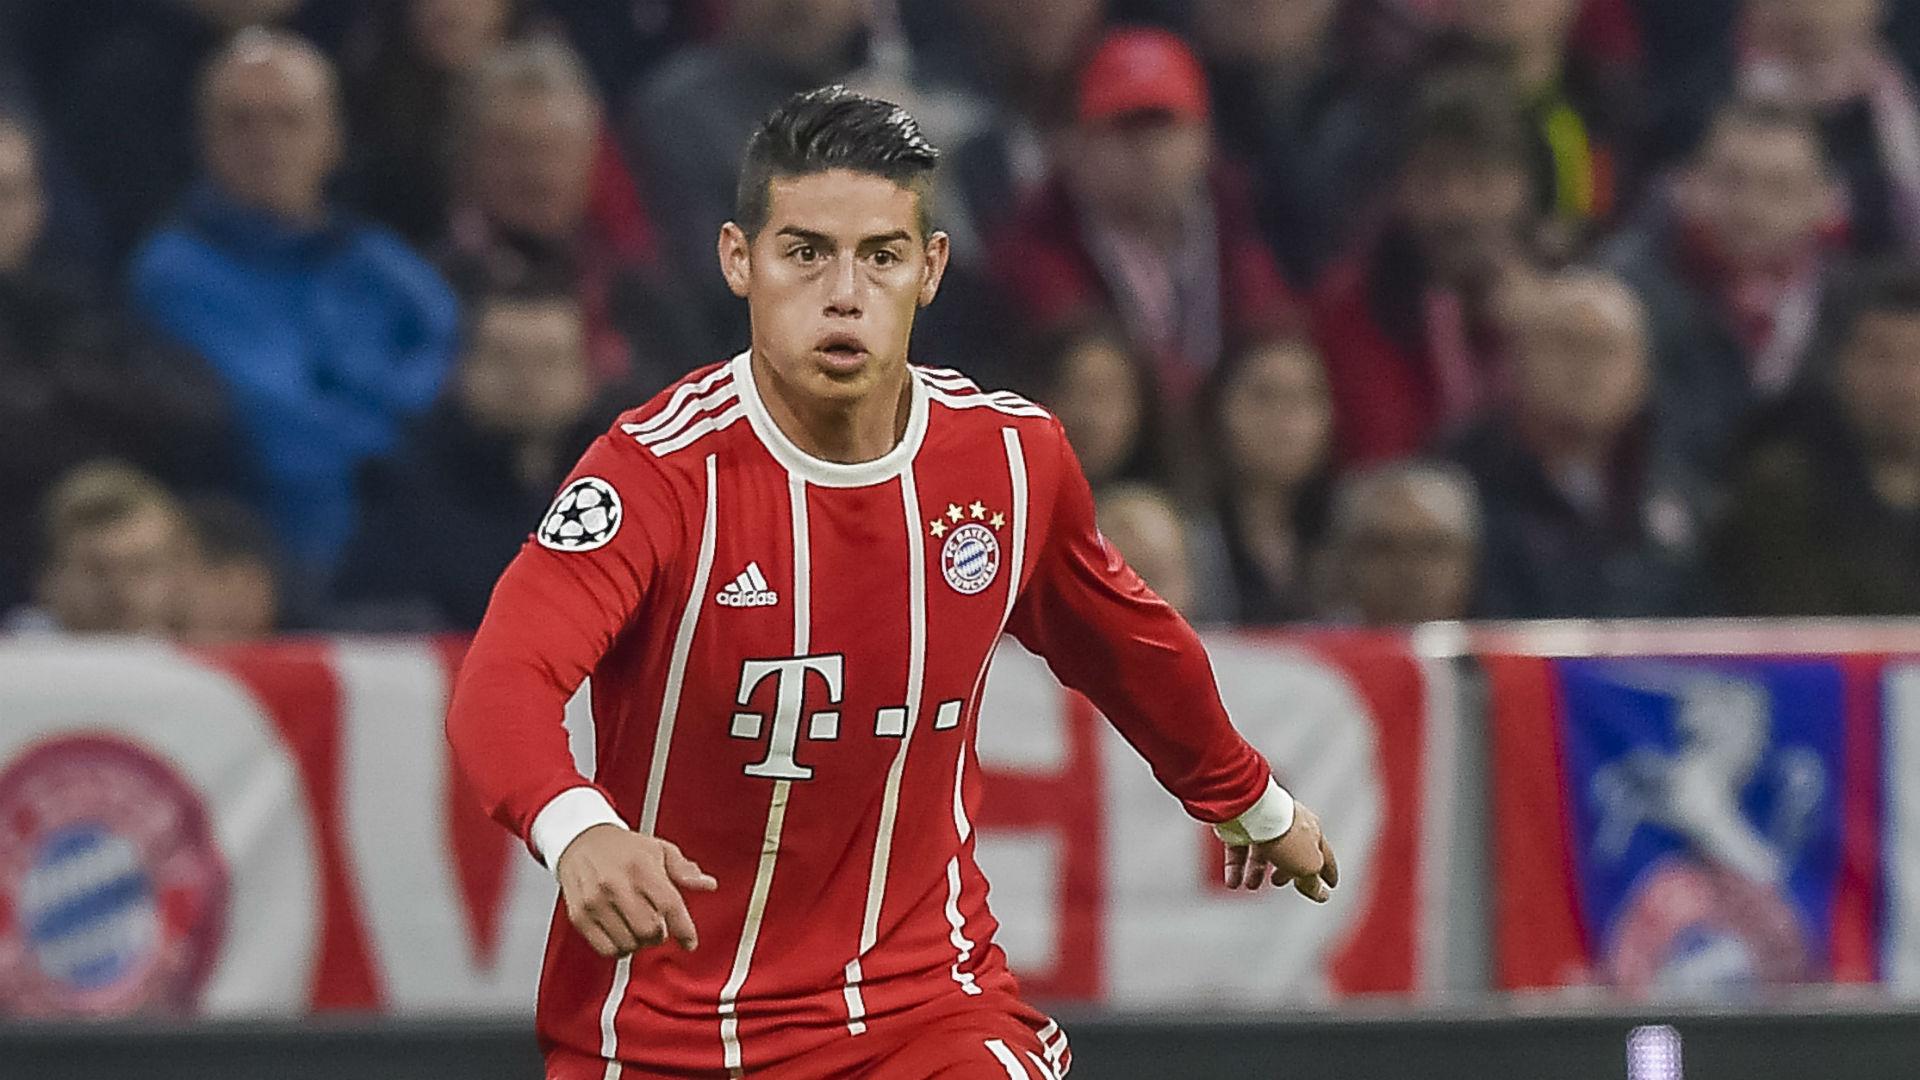 Volvió a ser feliz: James gritó en el Bayern Munich